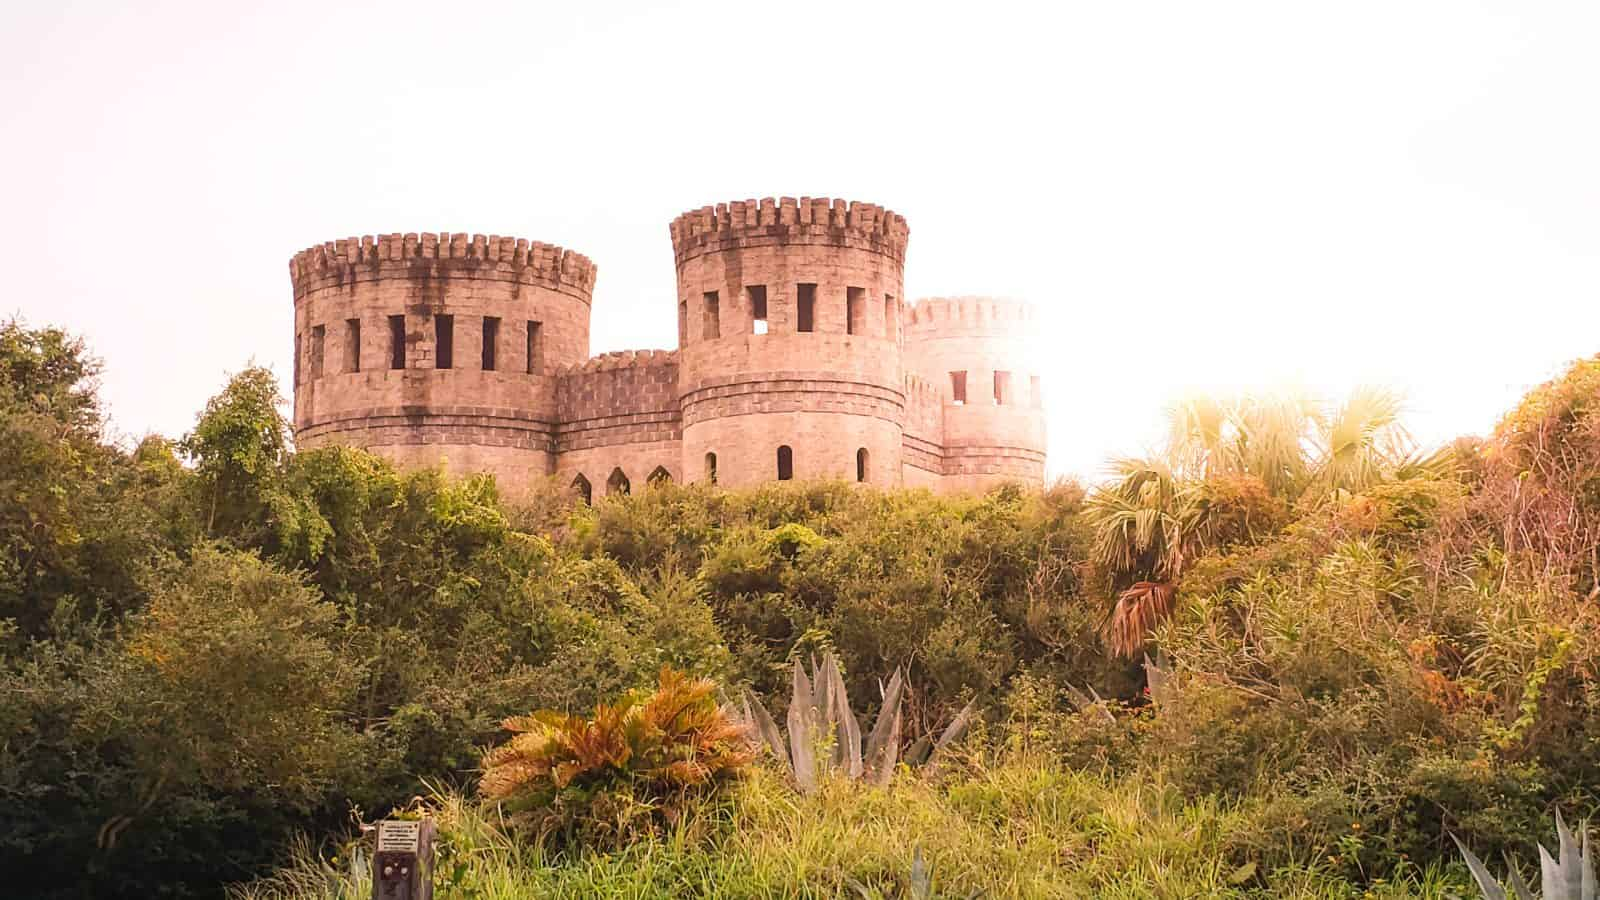 The Otttis Castle in St. Augustine, Florida.